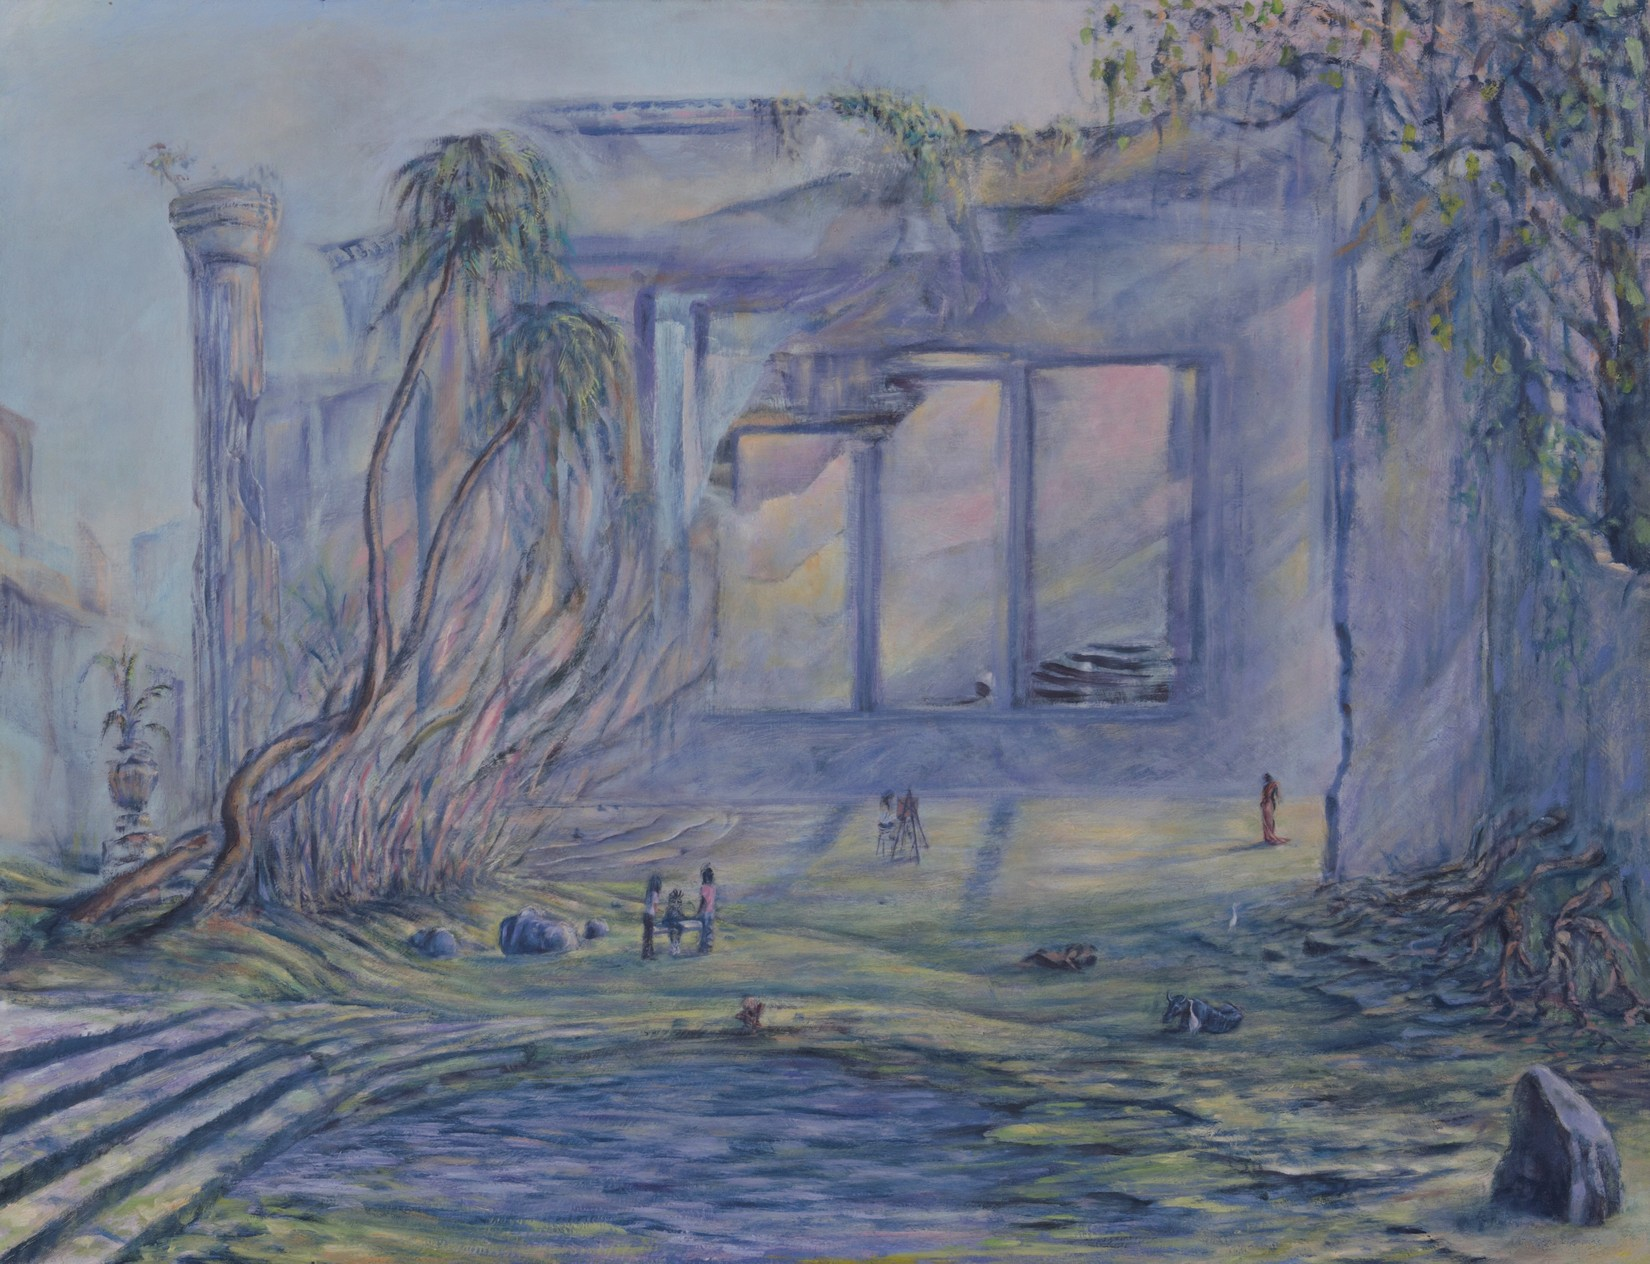 Painting Anecia - oil on masonite, 22x24